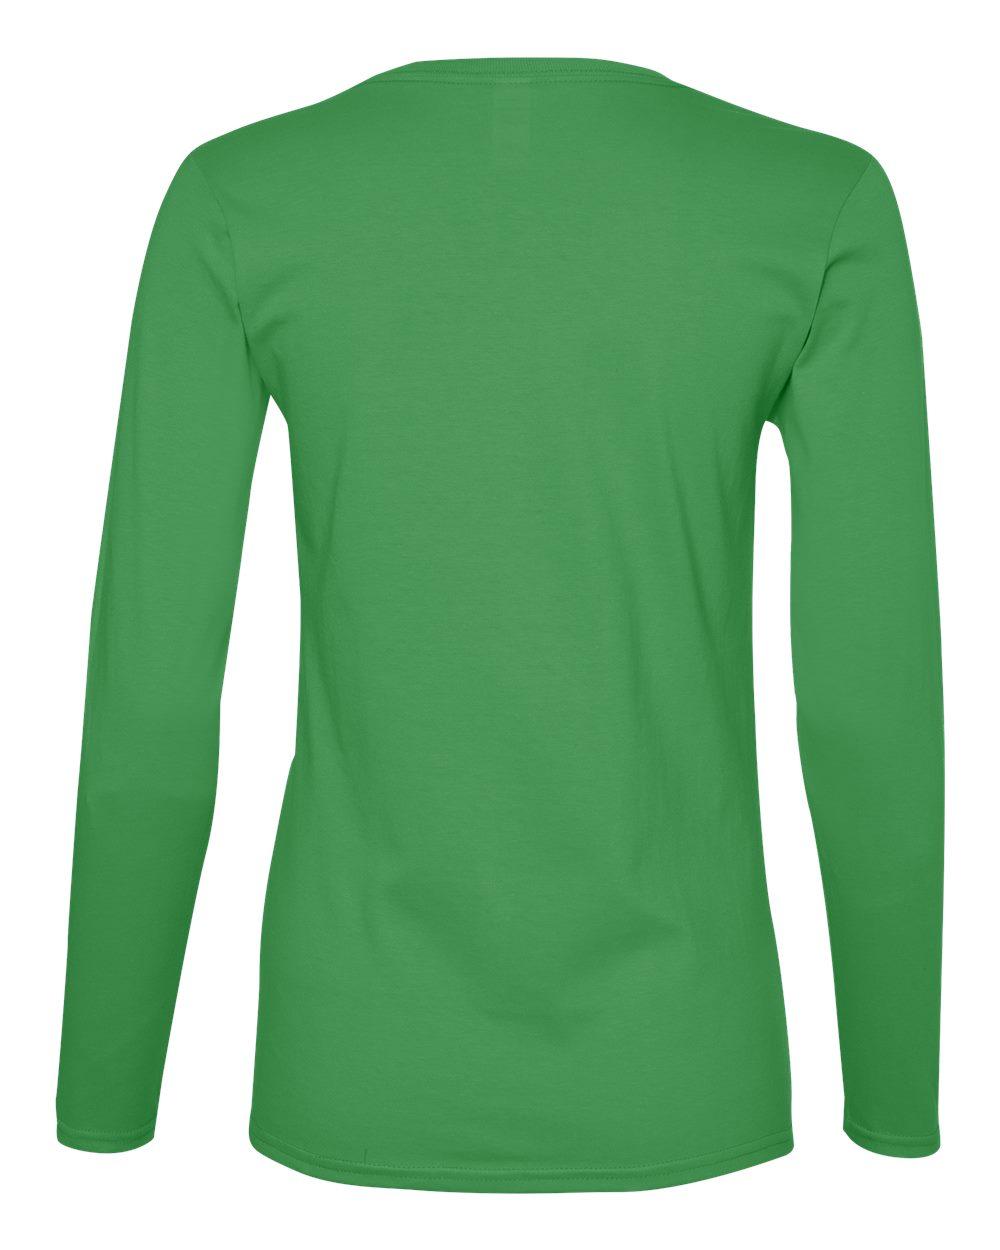 Anvil-Womens-Lightweight-Long-Sleeve-T-Shirt-884L-Size-S-2XL thumbnail 11